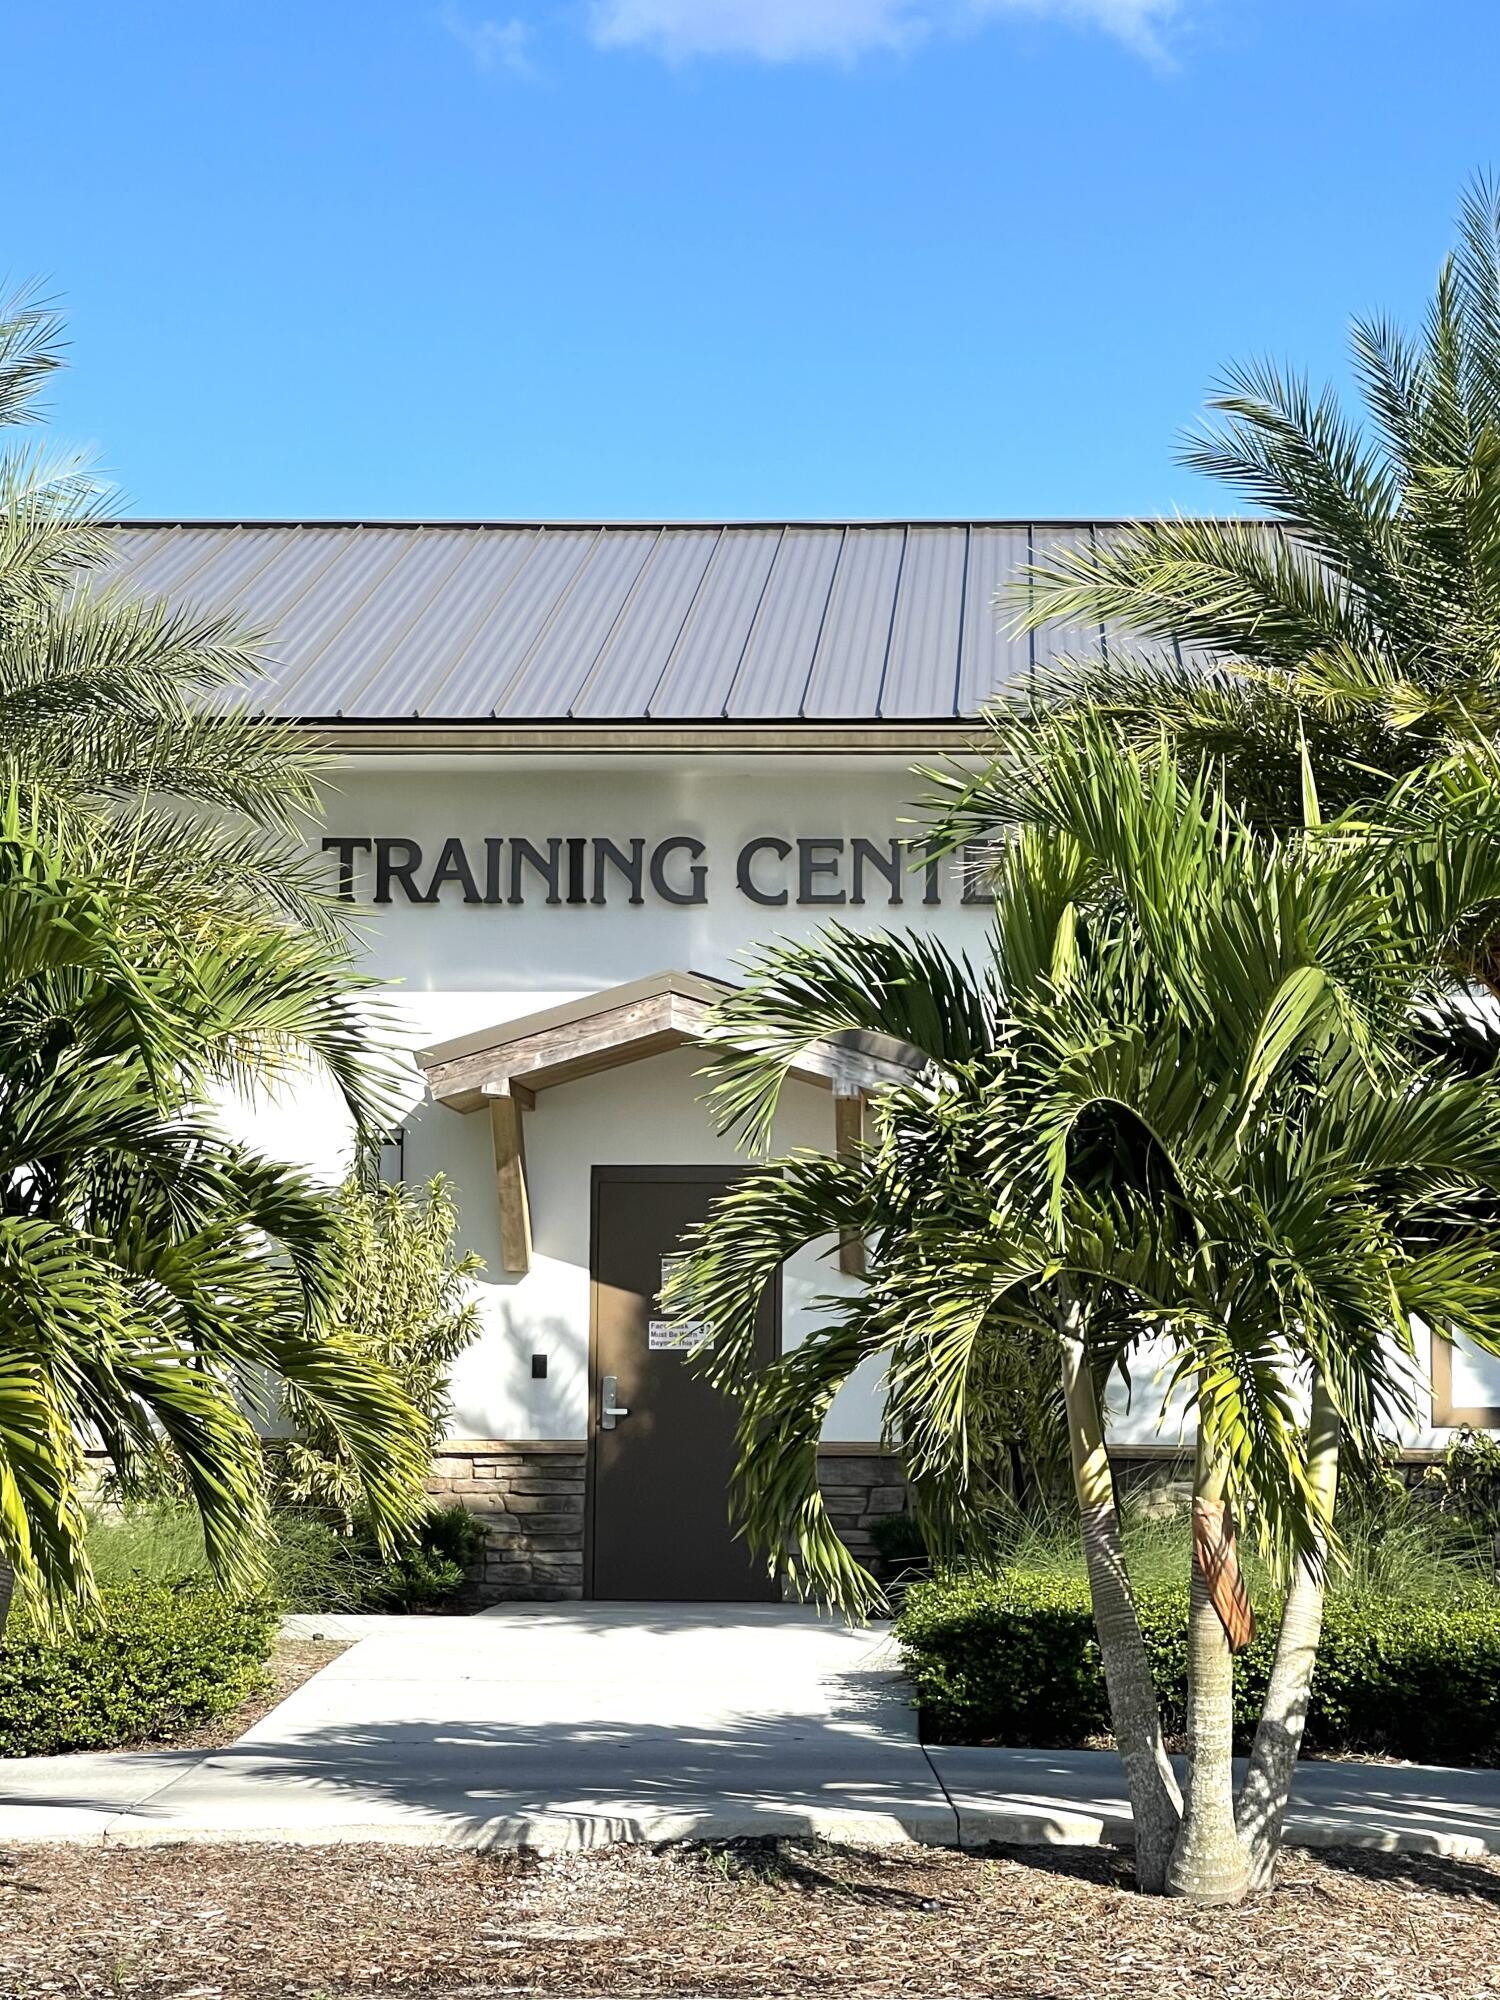 Sand Hill Crane Training Center